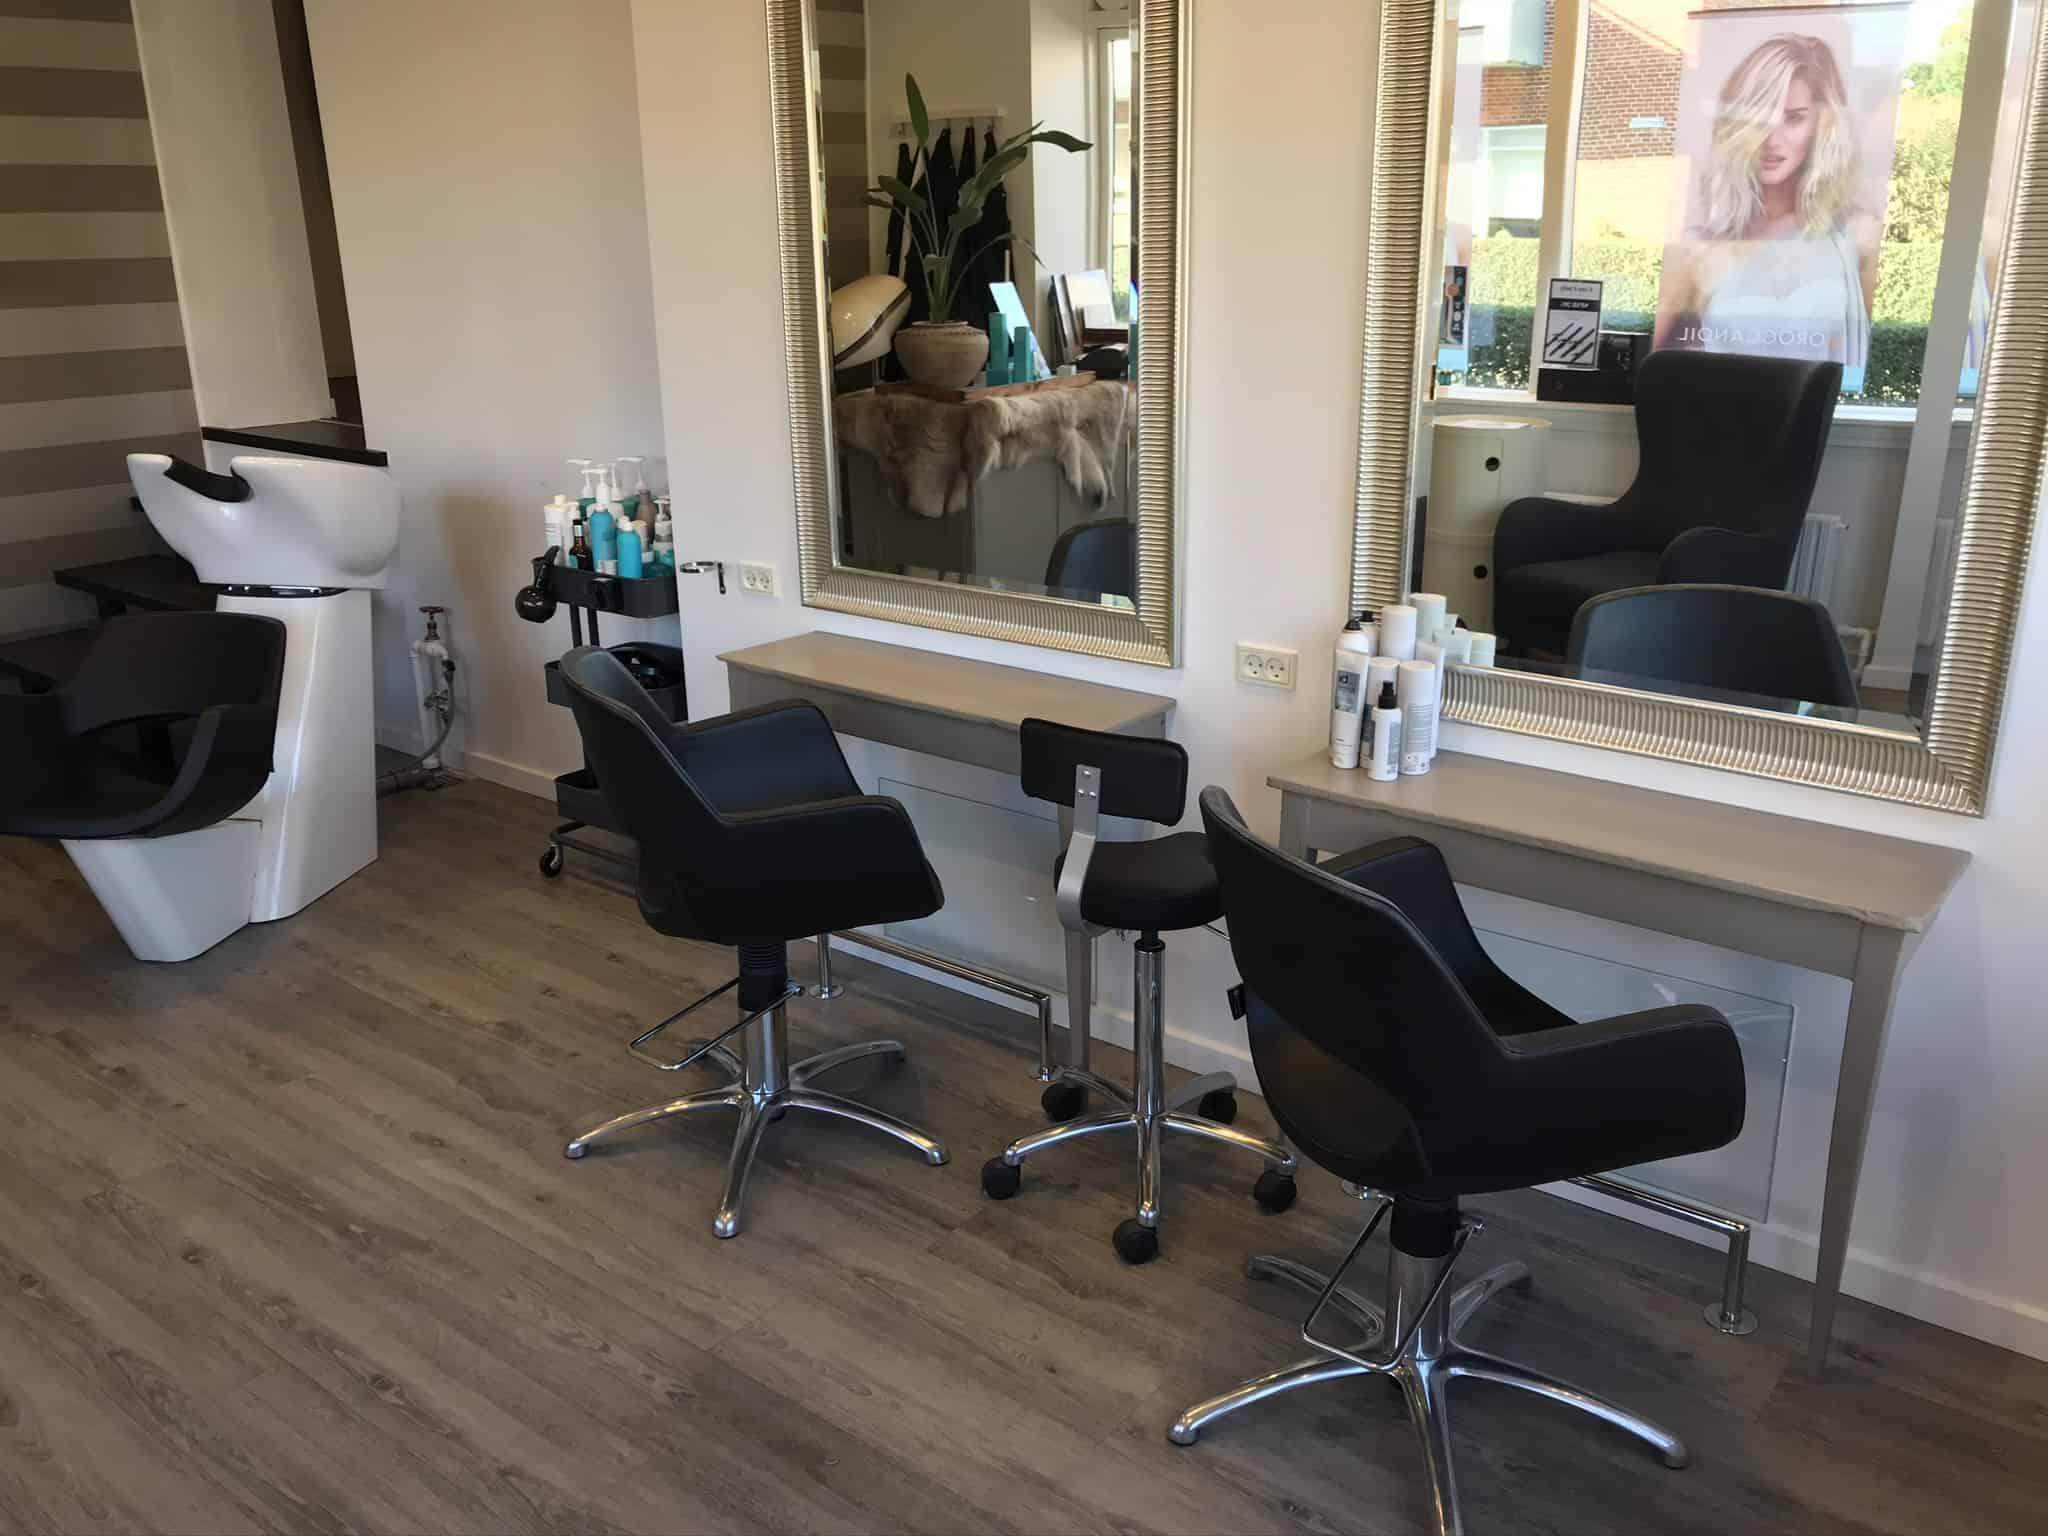 Siddepladserne i frisørsalonen